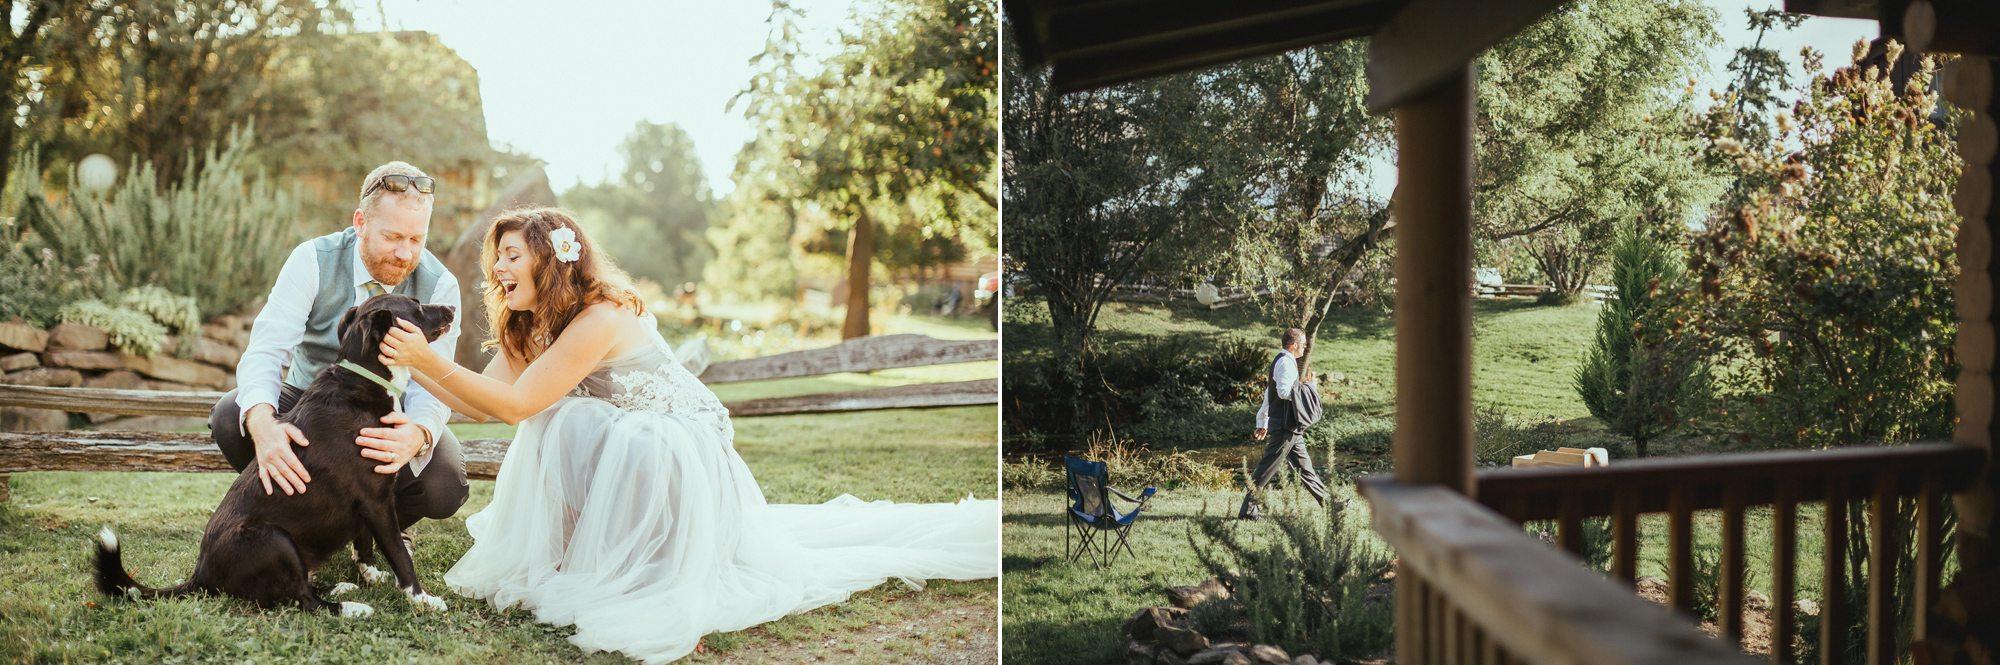 sarah-sal-galiano-wedding-photographer72